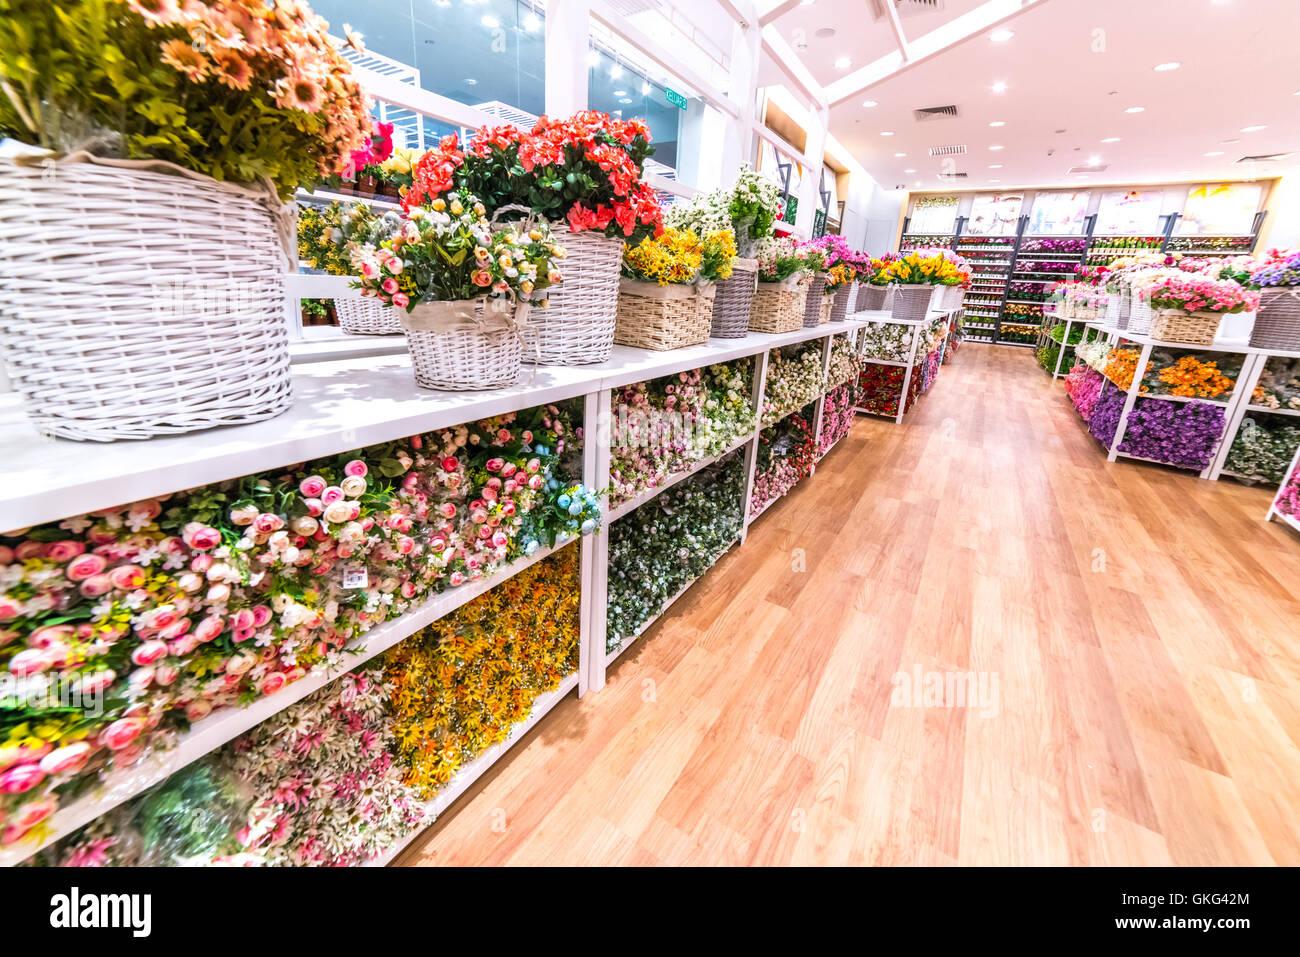 Kuala Lumpur Flower Shop Stock Photos Kuala Lumpur Flower Shop